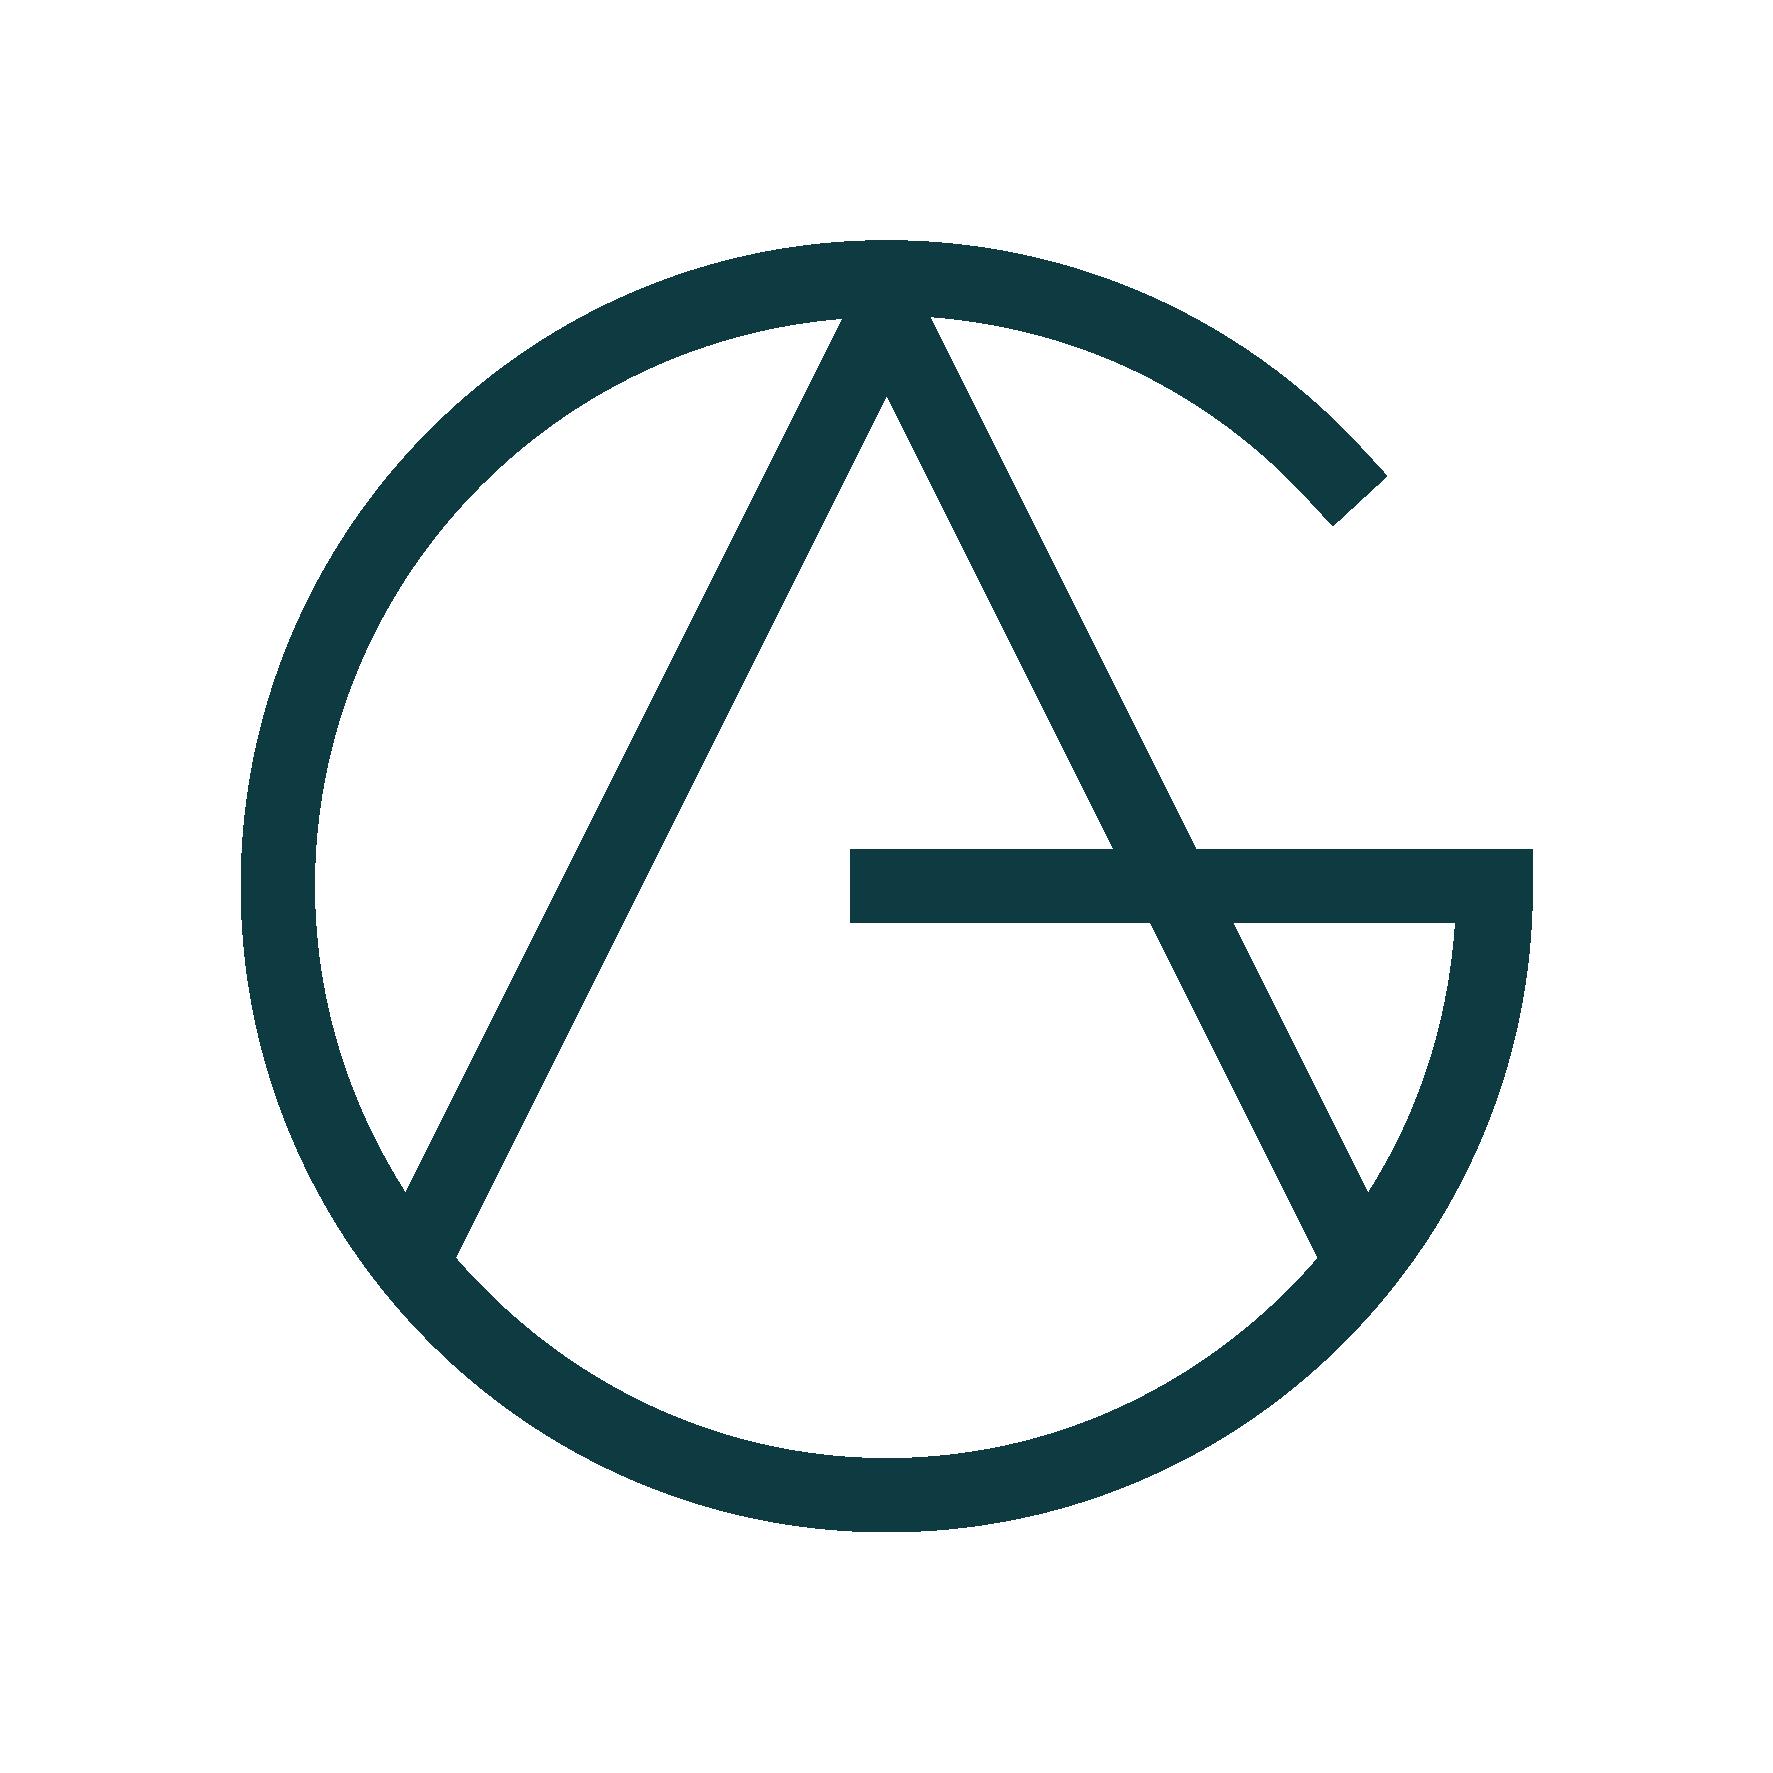 ADE_Logo_Symbol_Positive.png